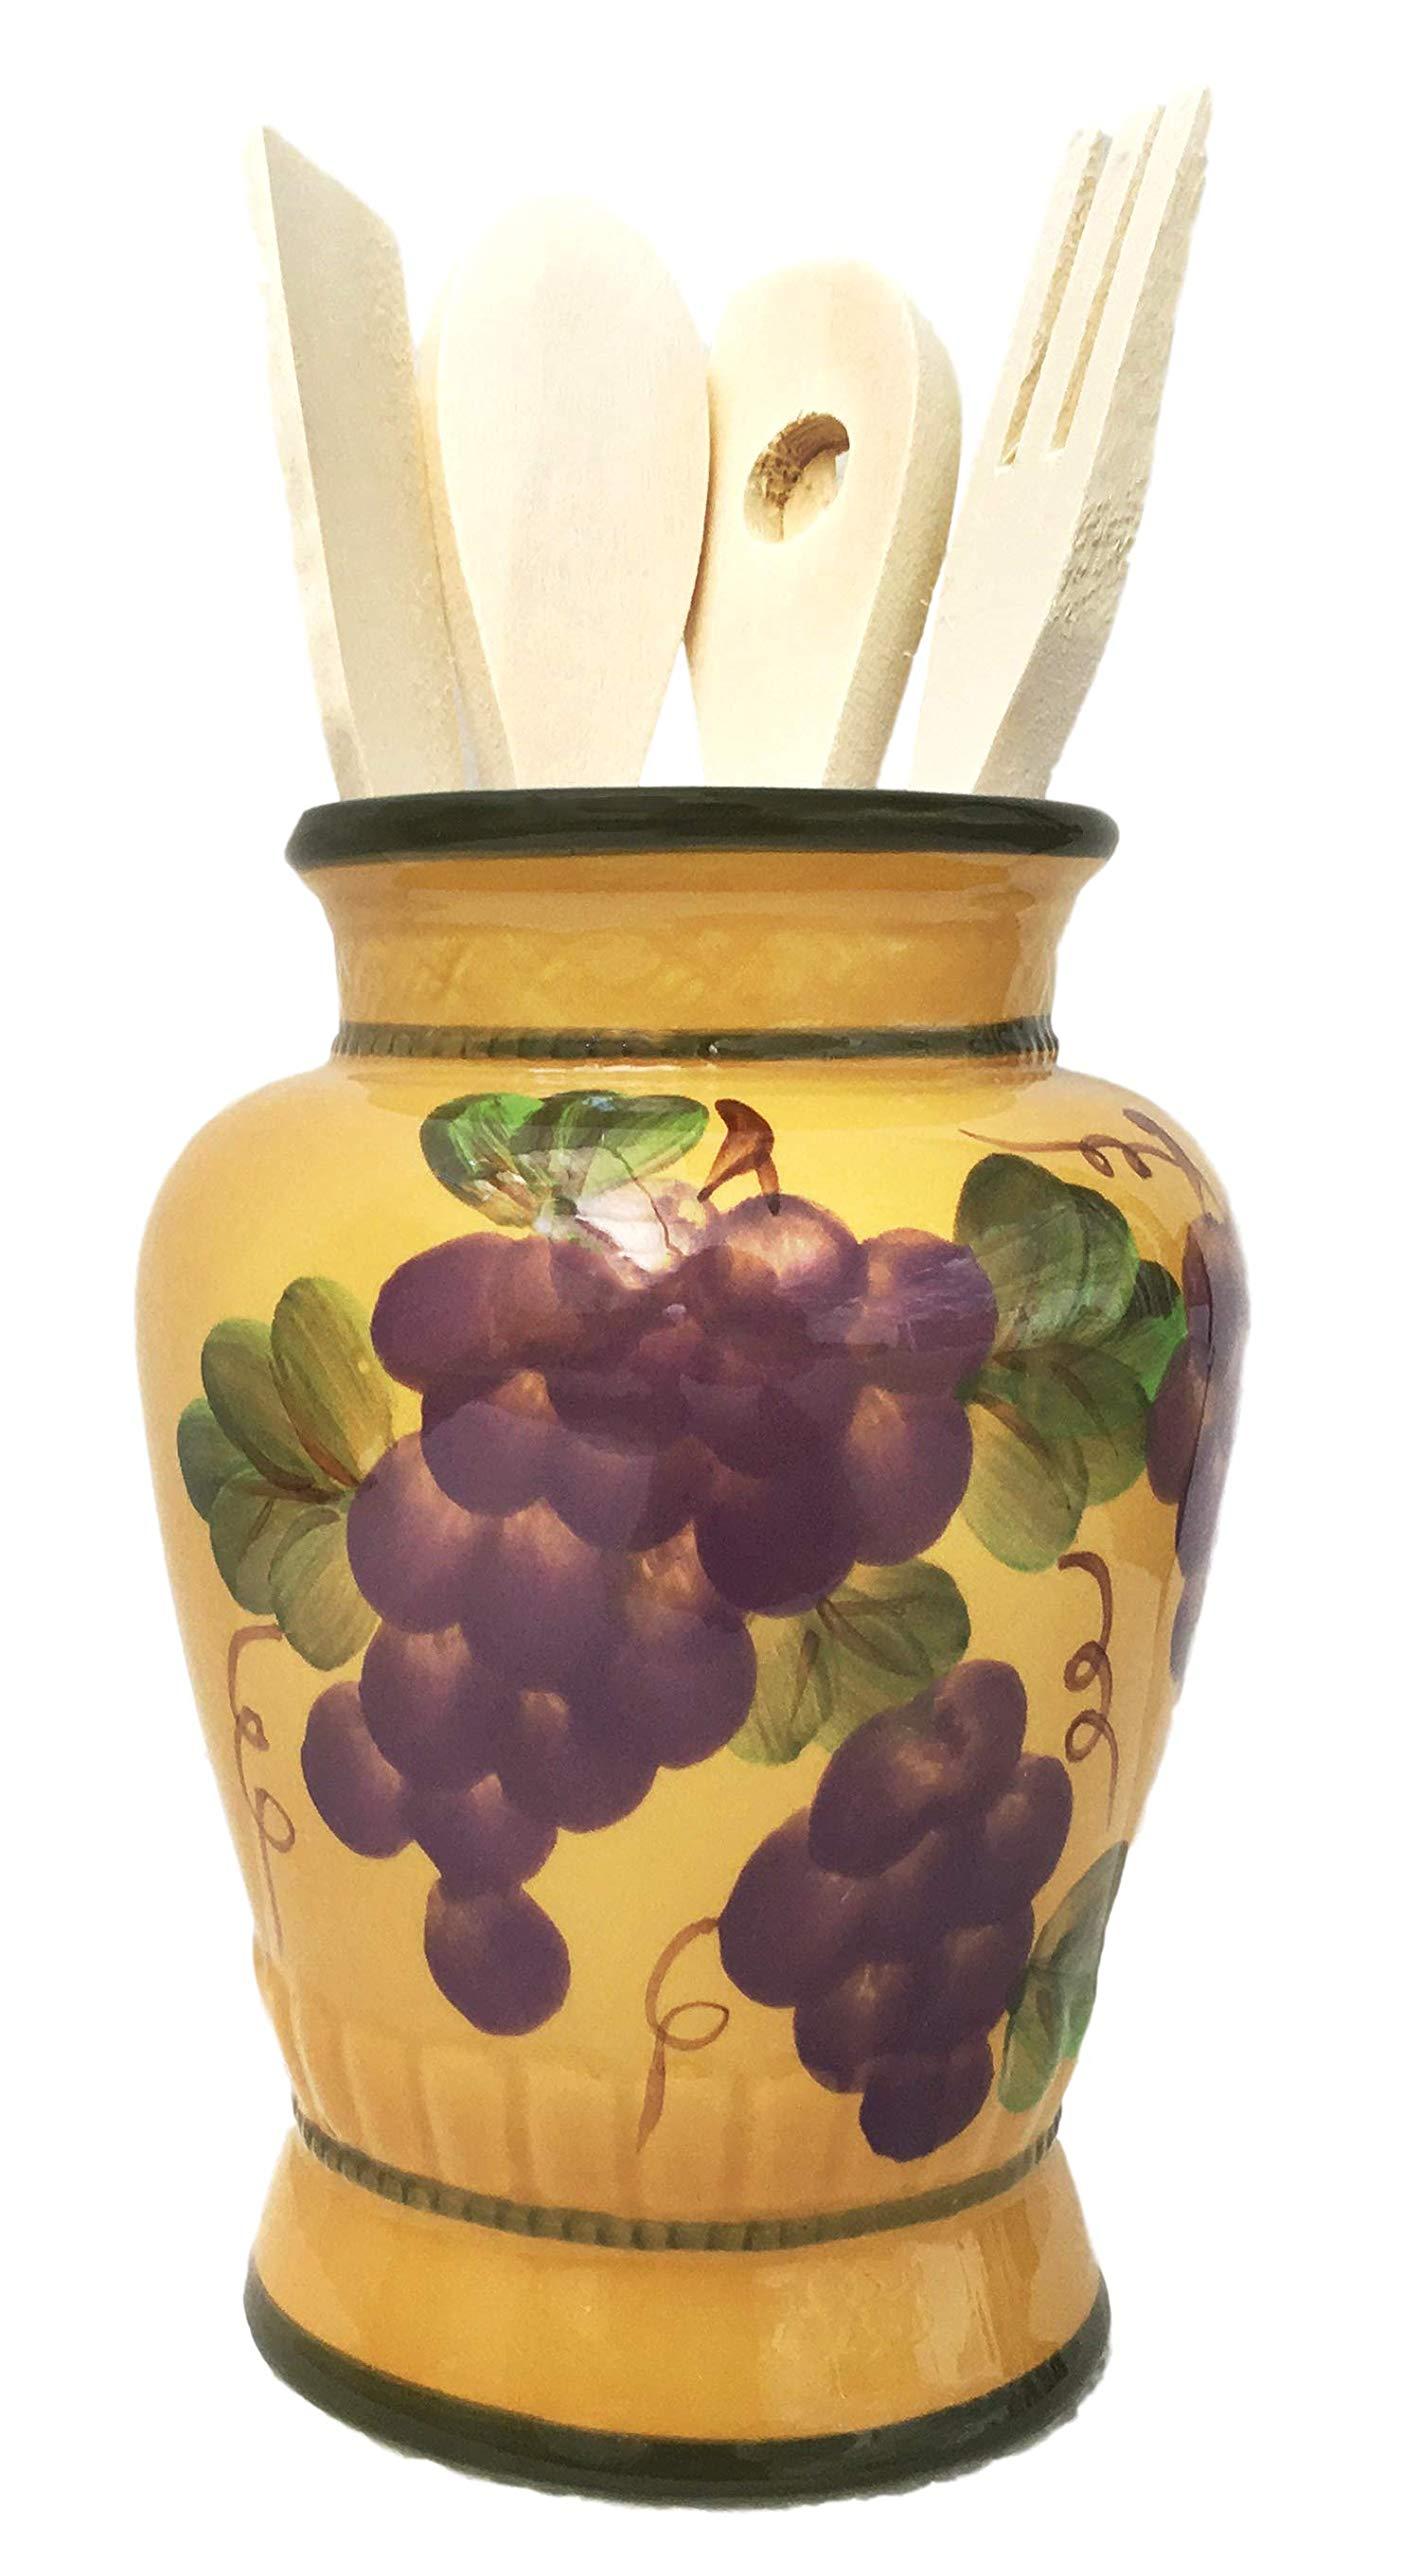 CASAVERO Kitchen Utensil Holder with Tools Grape Tuscany Decor